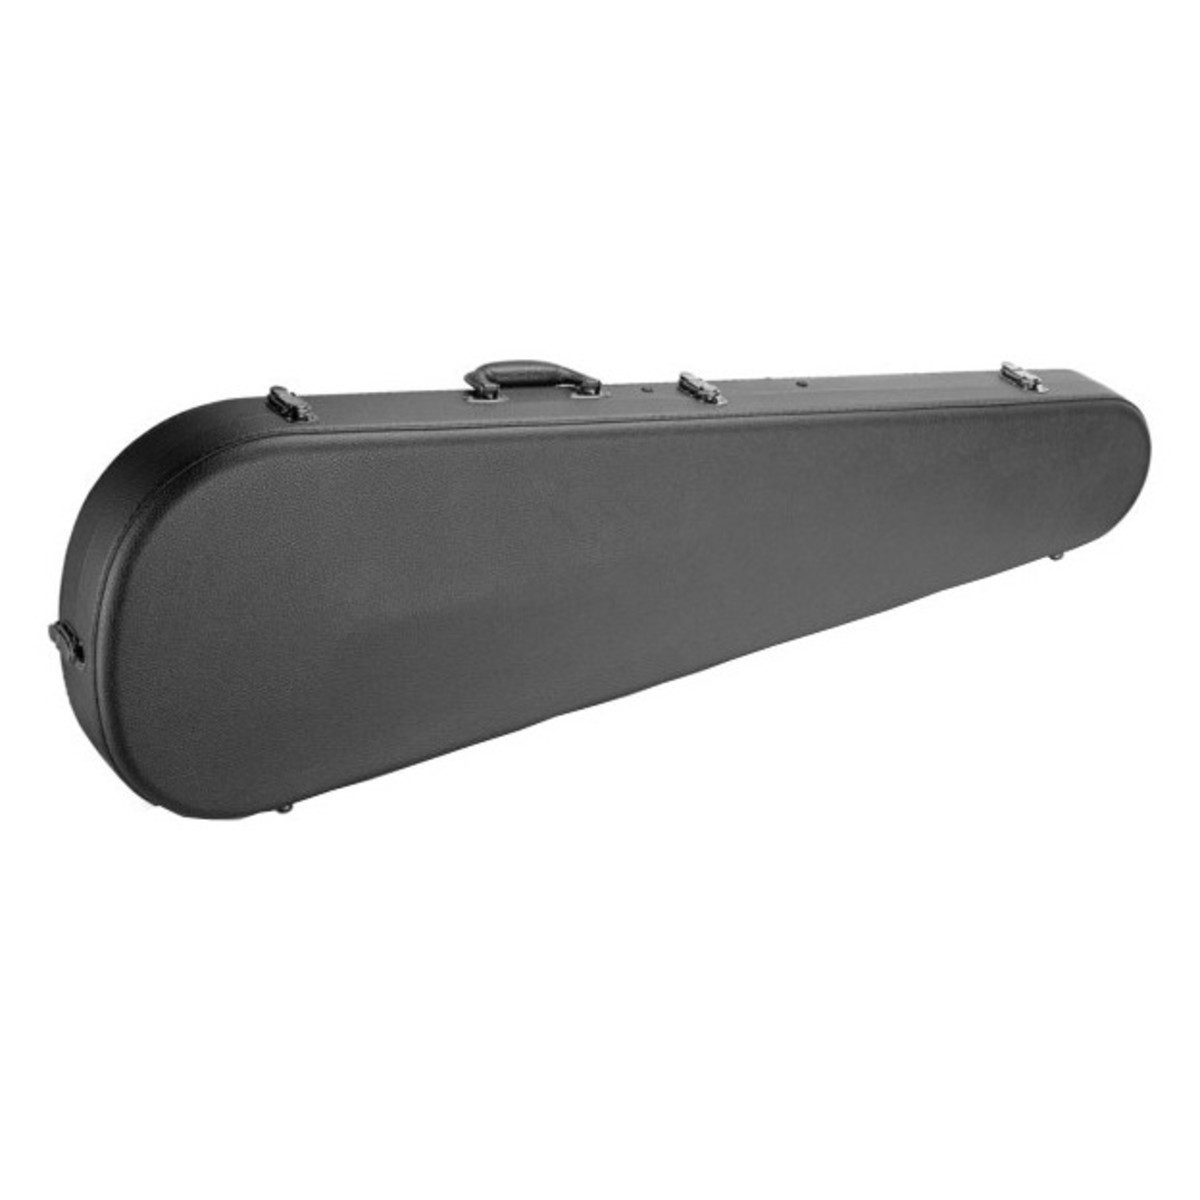 disc stagg bass guitar hard case polyurethane at gear4music. Black Bedroom Furniture Sets. Home Design Ideas